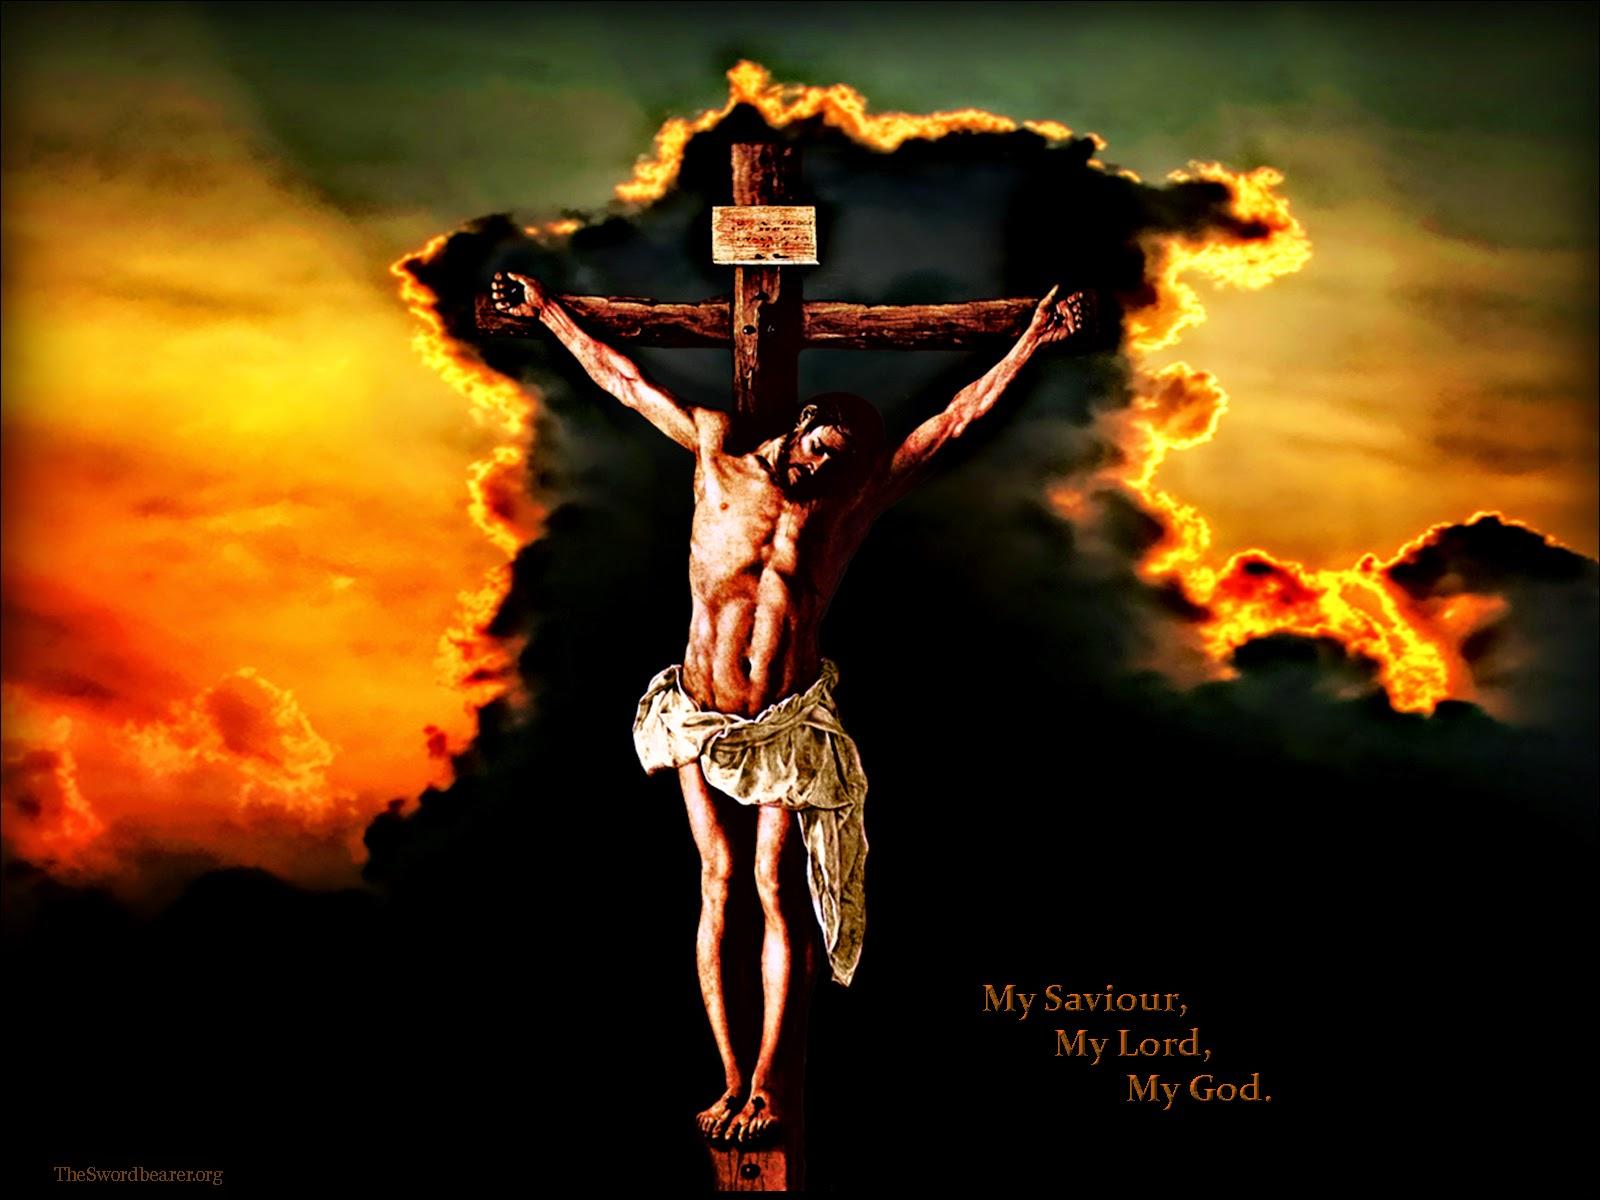 Wallpaper Salib Keren - Jesus Christ On The Cross Hd - 1600x1200 Wallpaper  - Teahub.io